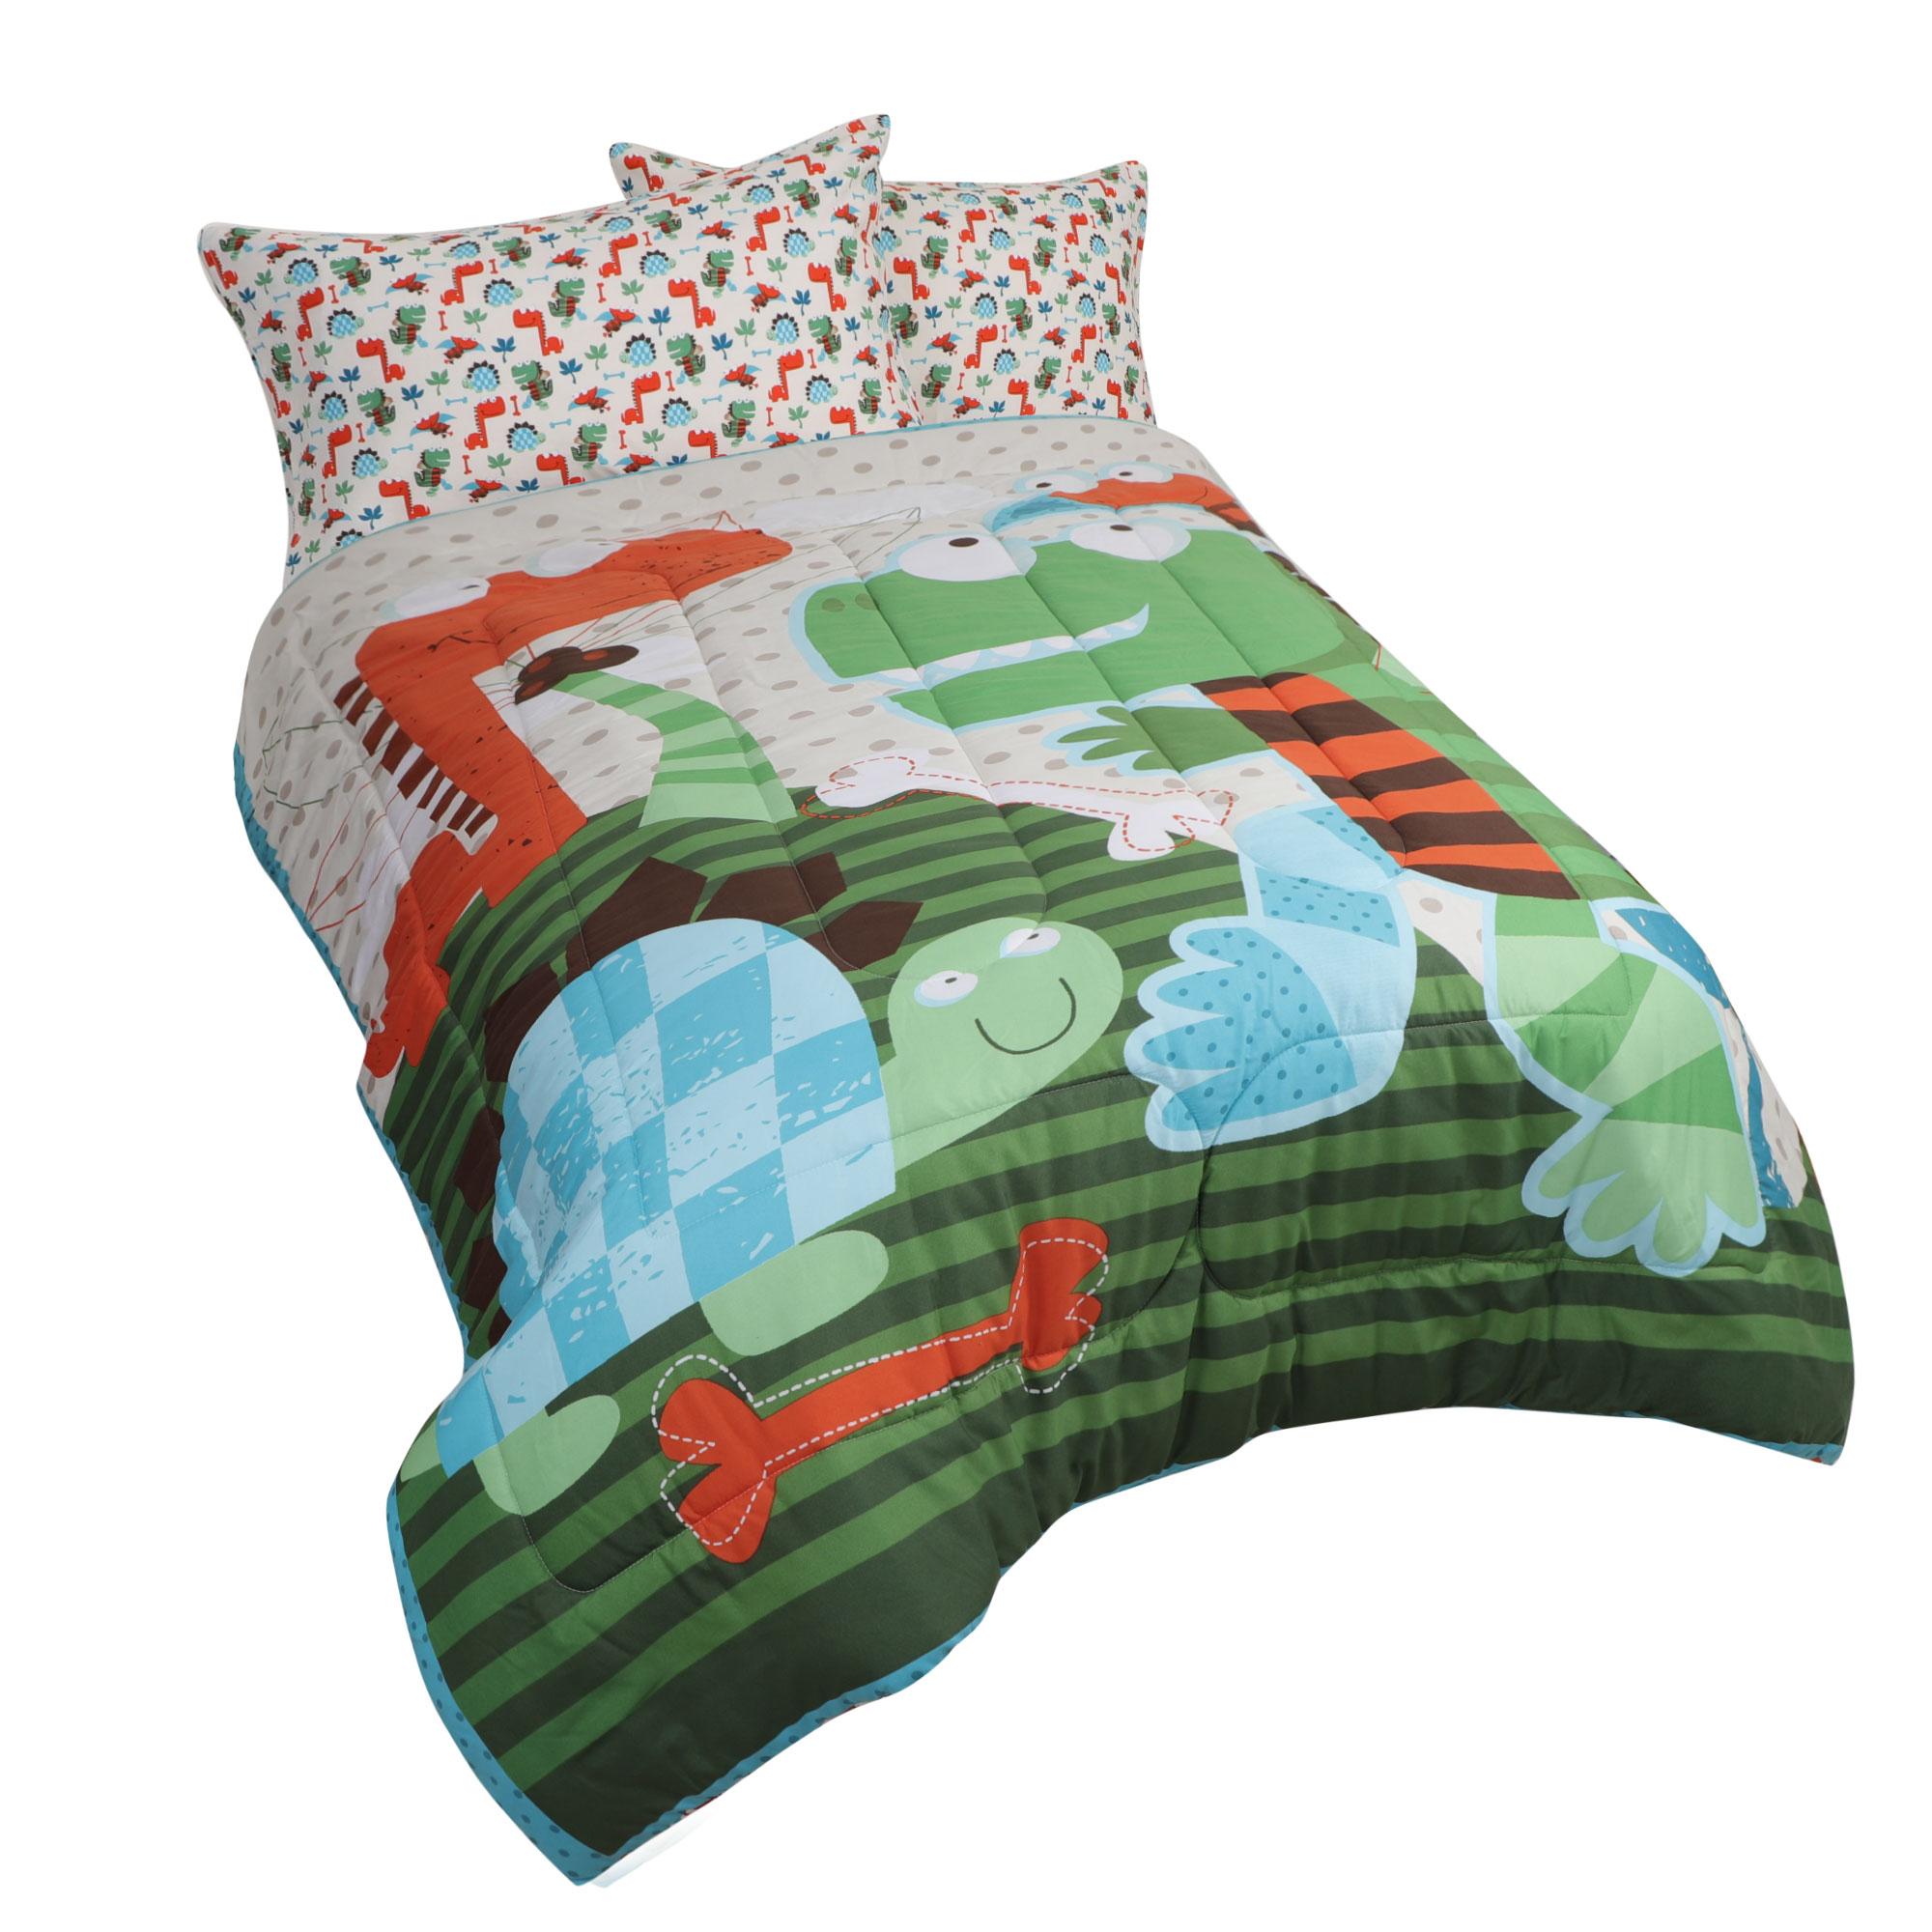 3 Piece Polyester Microfiber Kids Bedding Comforter Set Dinosaur Twin